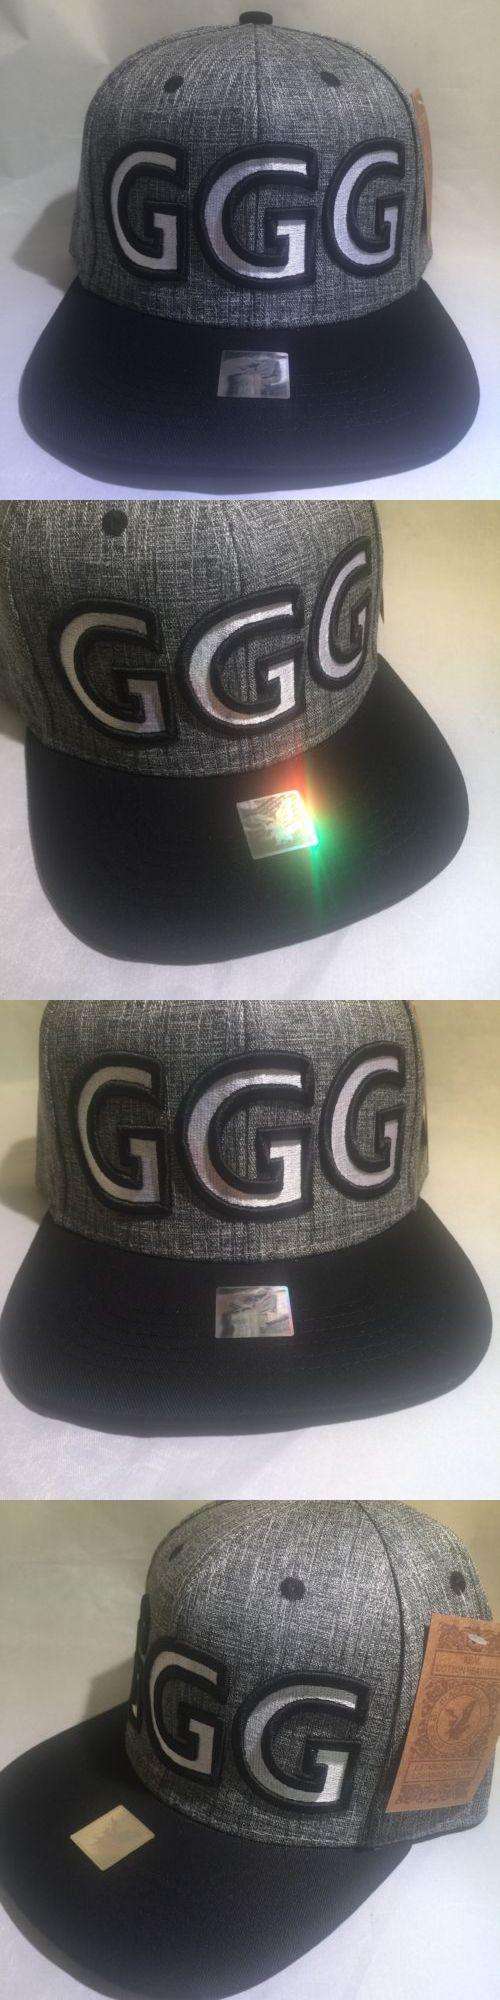 Headbands and Hats 179769: Ggg God Of War Canelo Alvarez Gennady Golovkin Boxing Hat Boxer Snapback Custom1 -> BUY IT NOW ONLY: $34.99 on eBay!